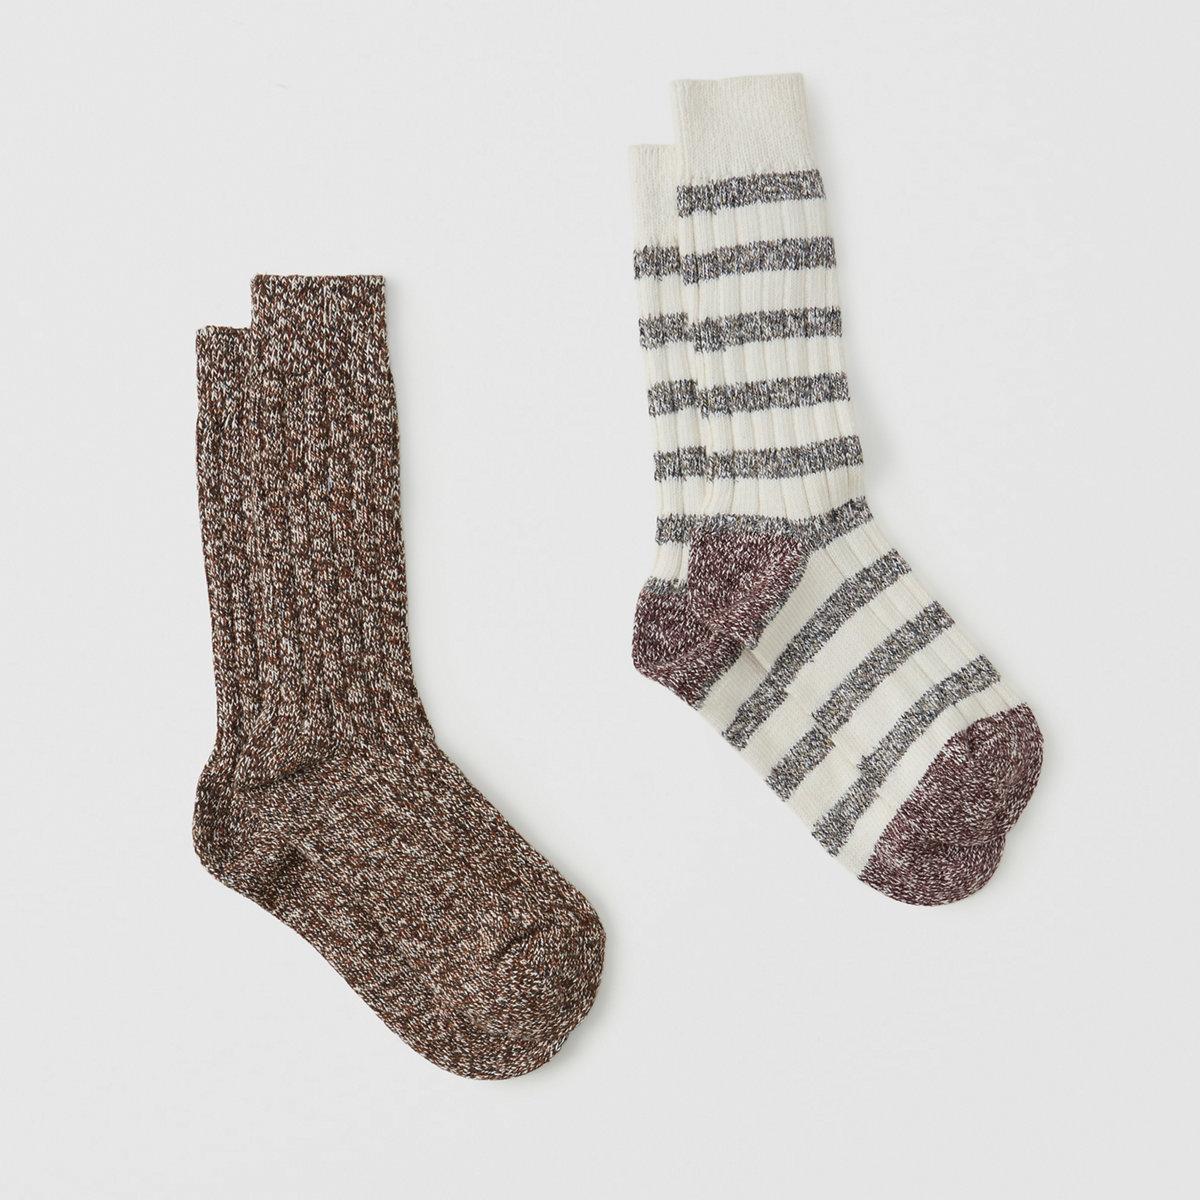 2-Pack Camping Socks